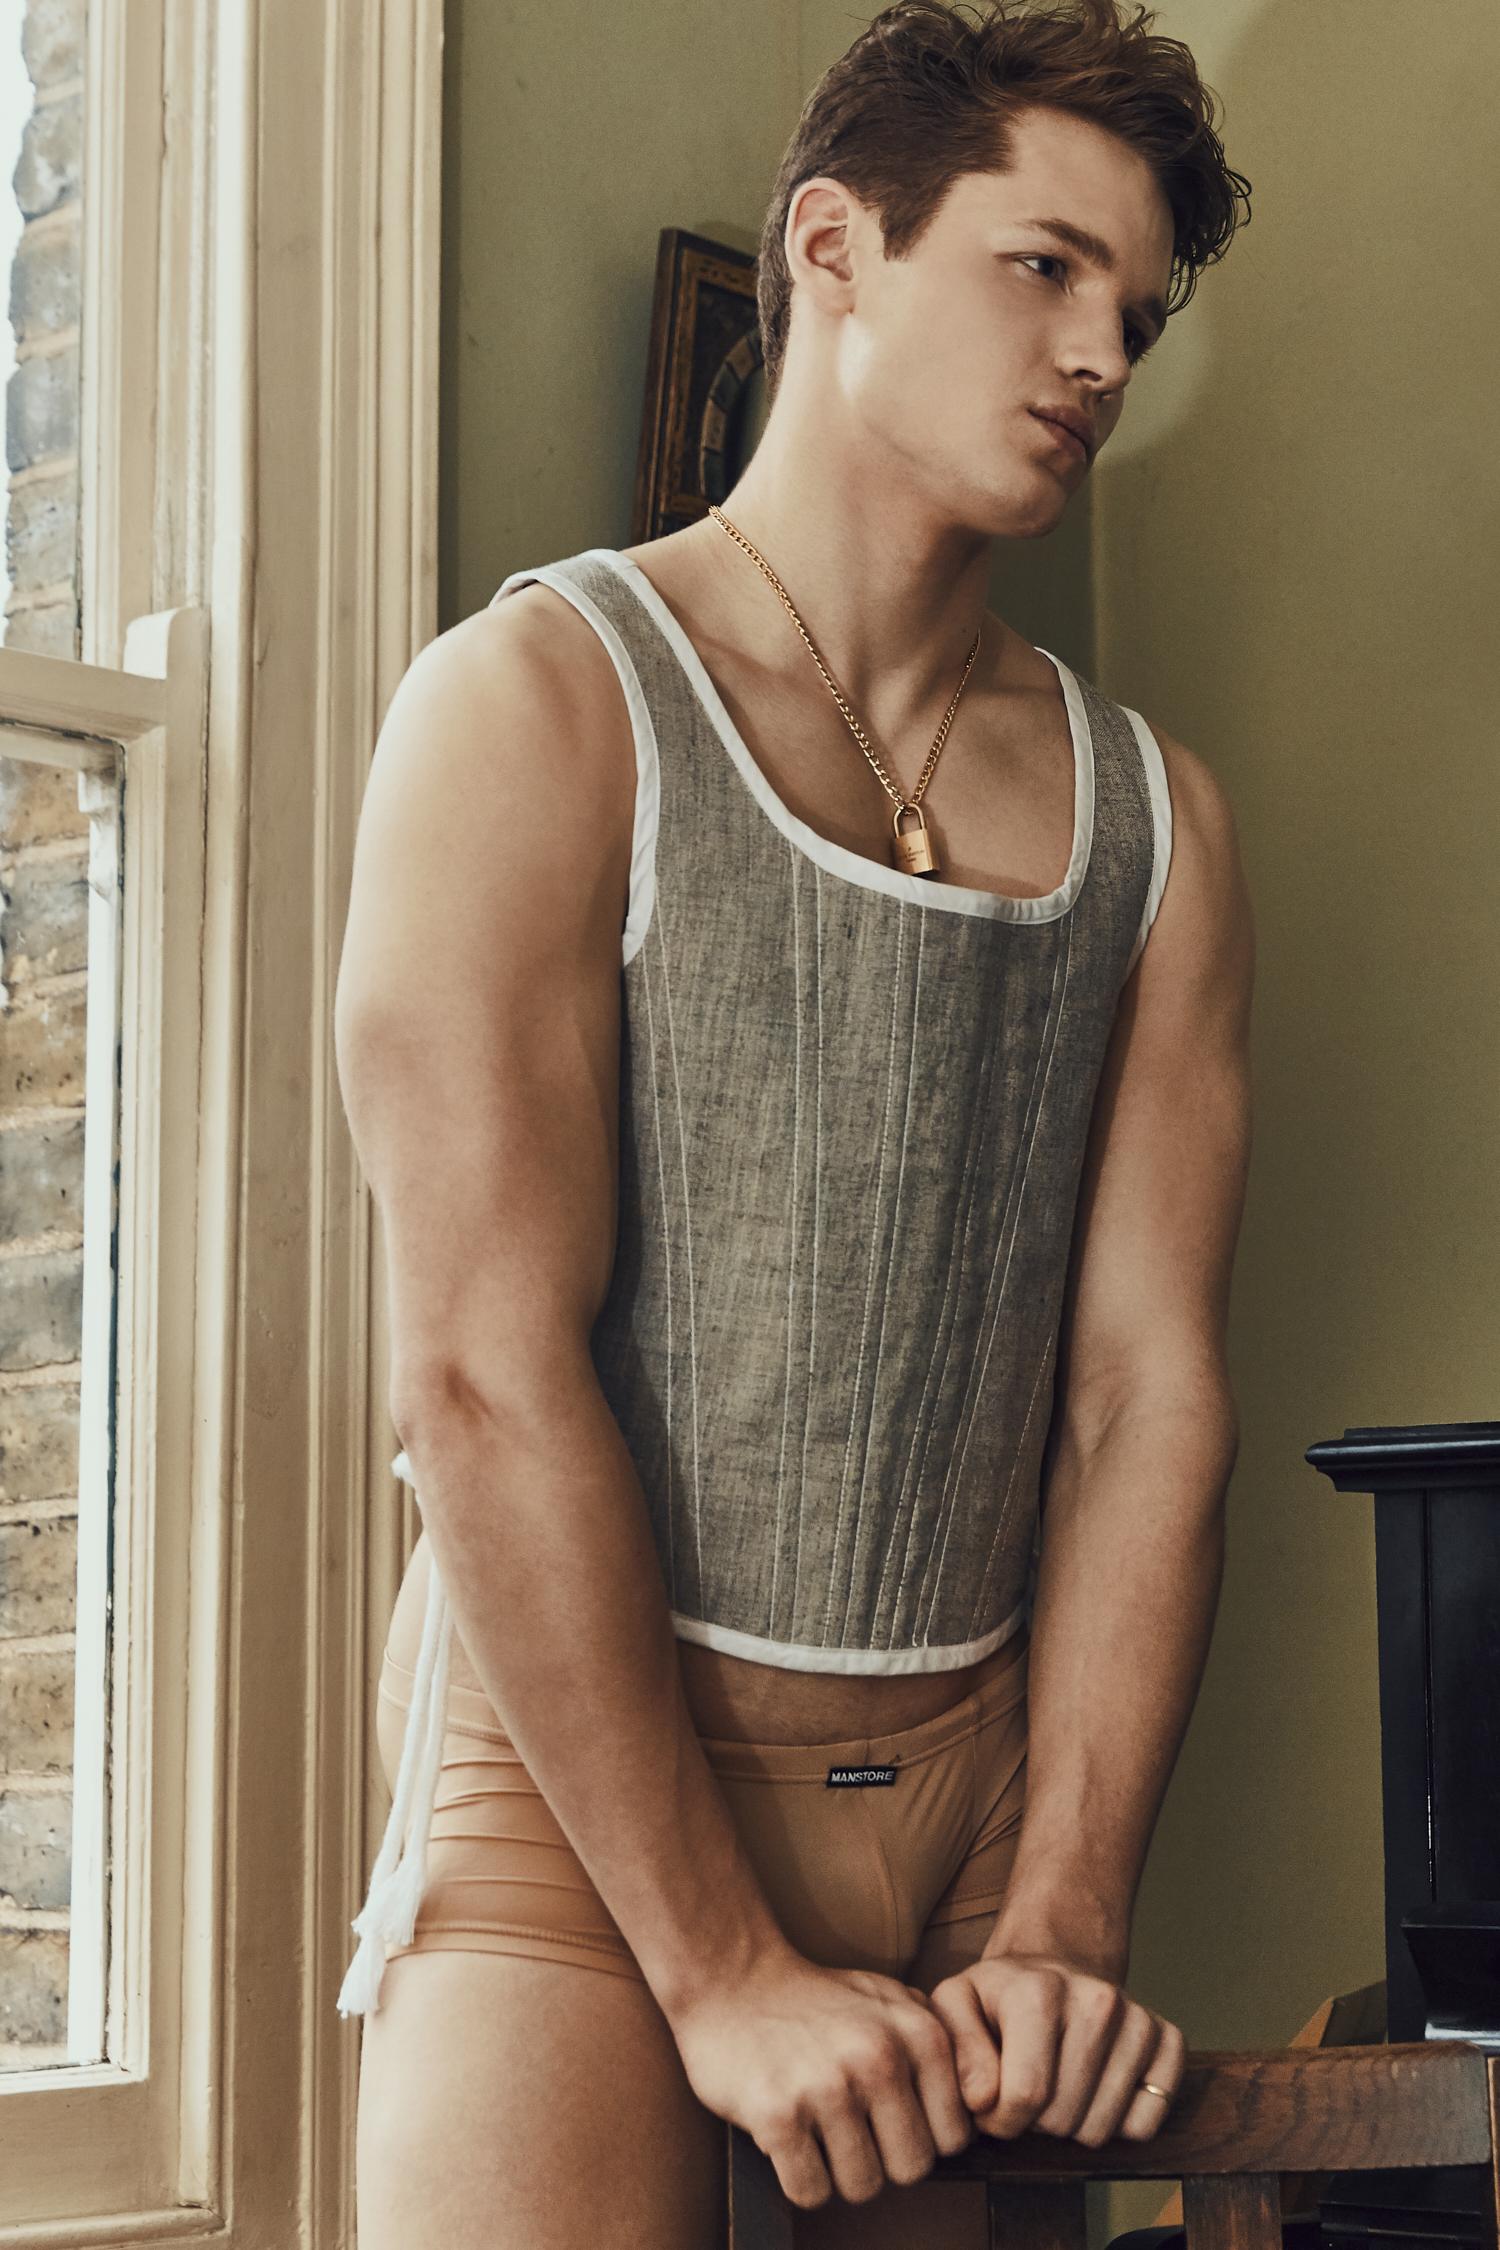 Top -  Daniel W. Fletcher , Briefs -  Manstore , Necklace - Models Own